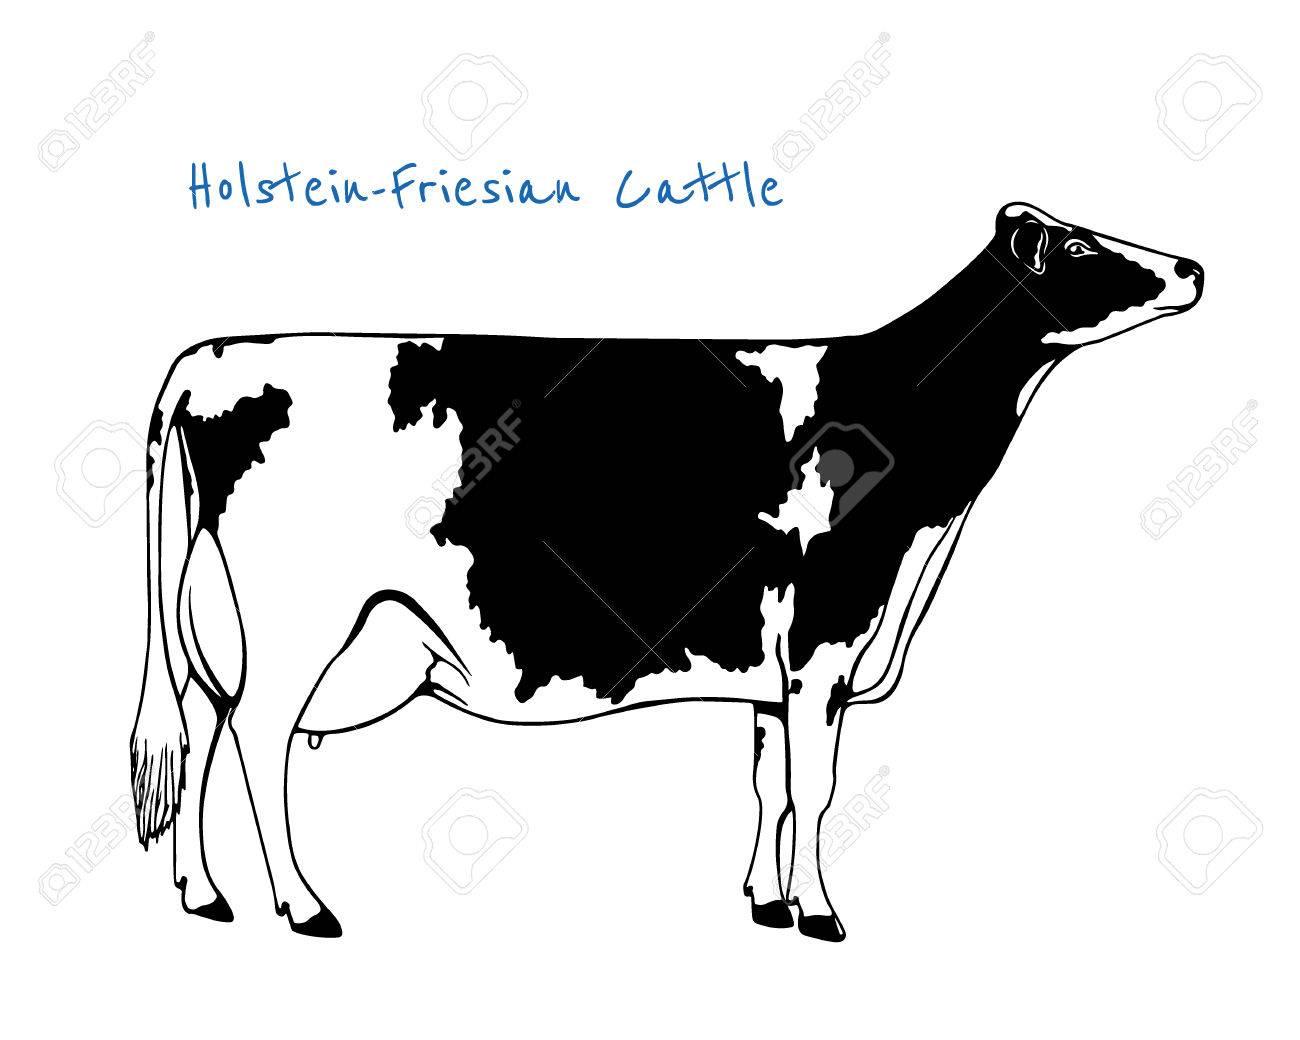 Vector Illustration Of Hand Drawn Holstein Friesian Cattle